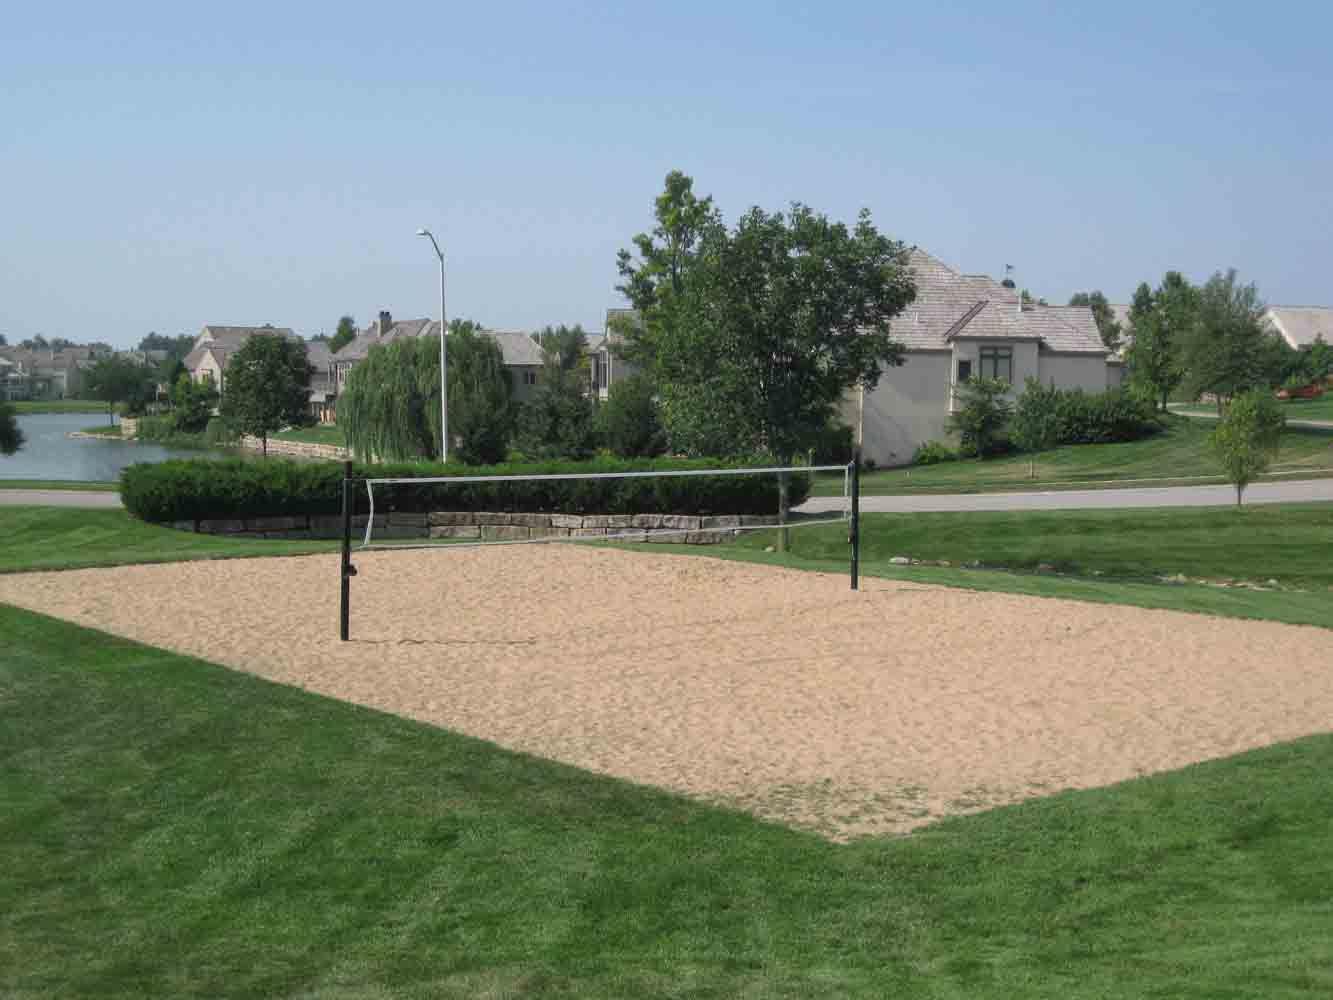 Backyard Sand Volleyball Pit Yes Please Volei De Areia Volei De Praia Projeto De Cozinha Ao Ar Livre